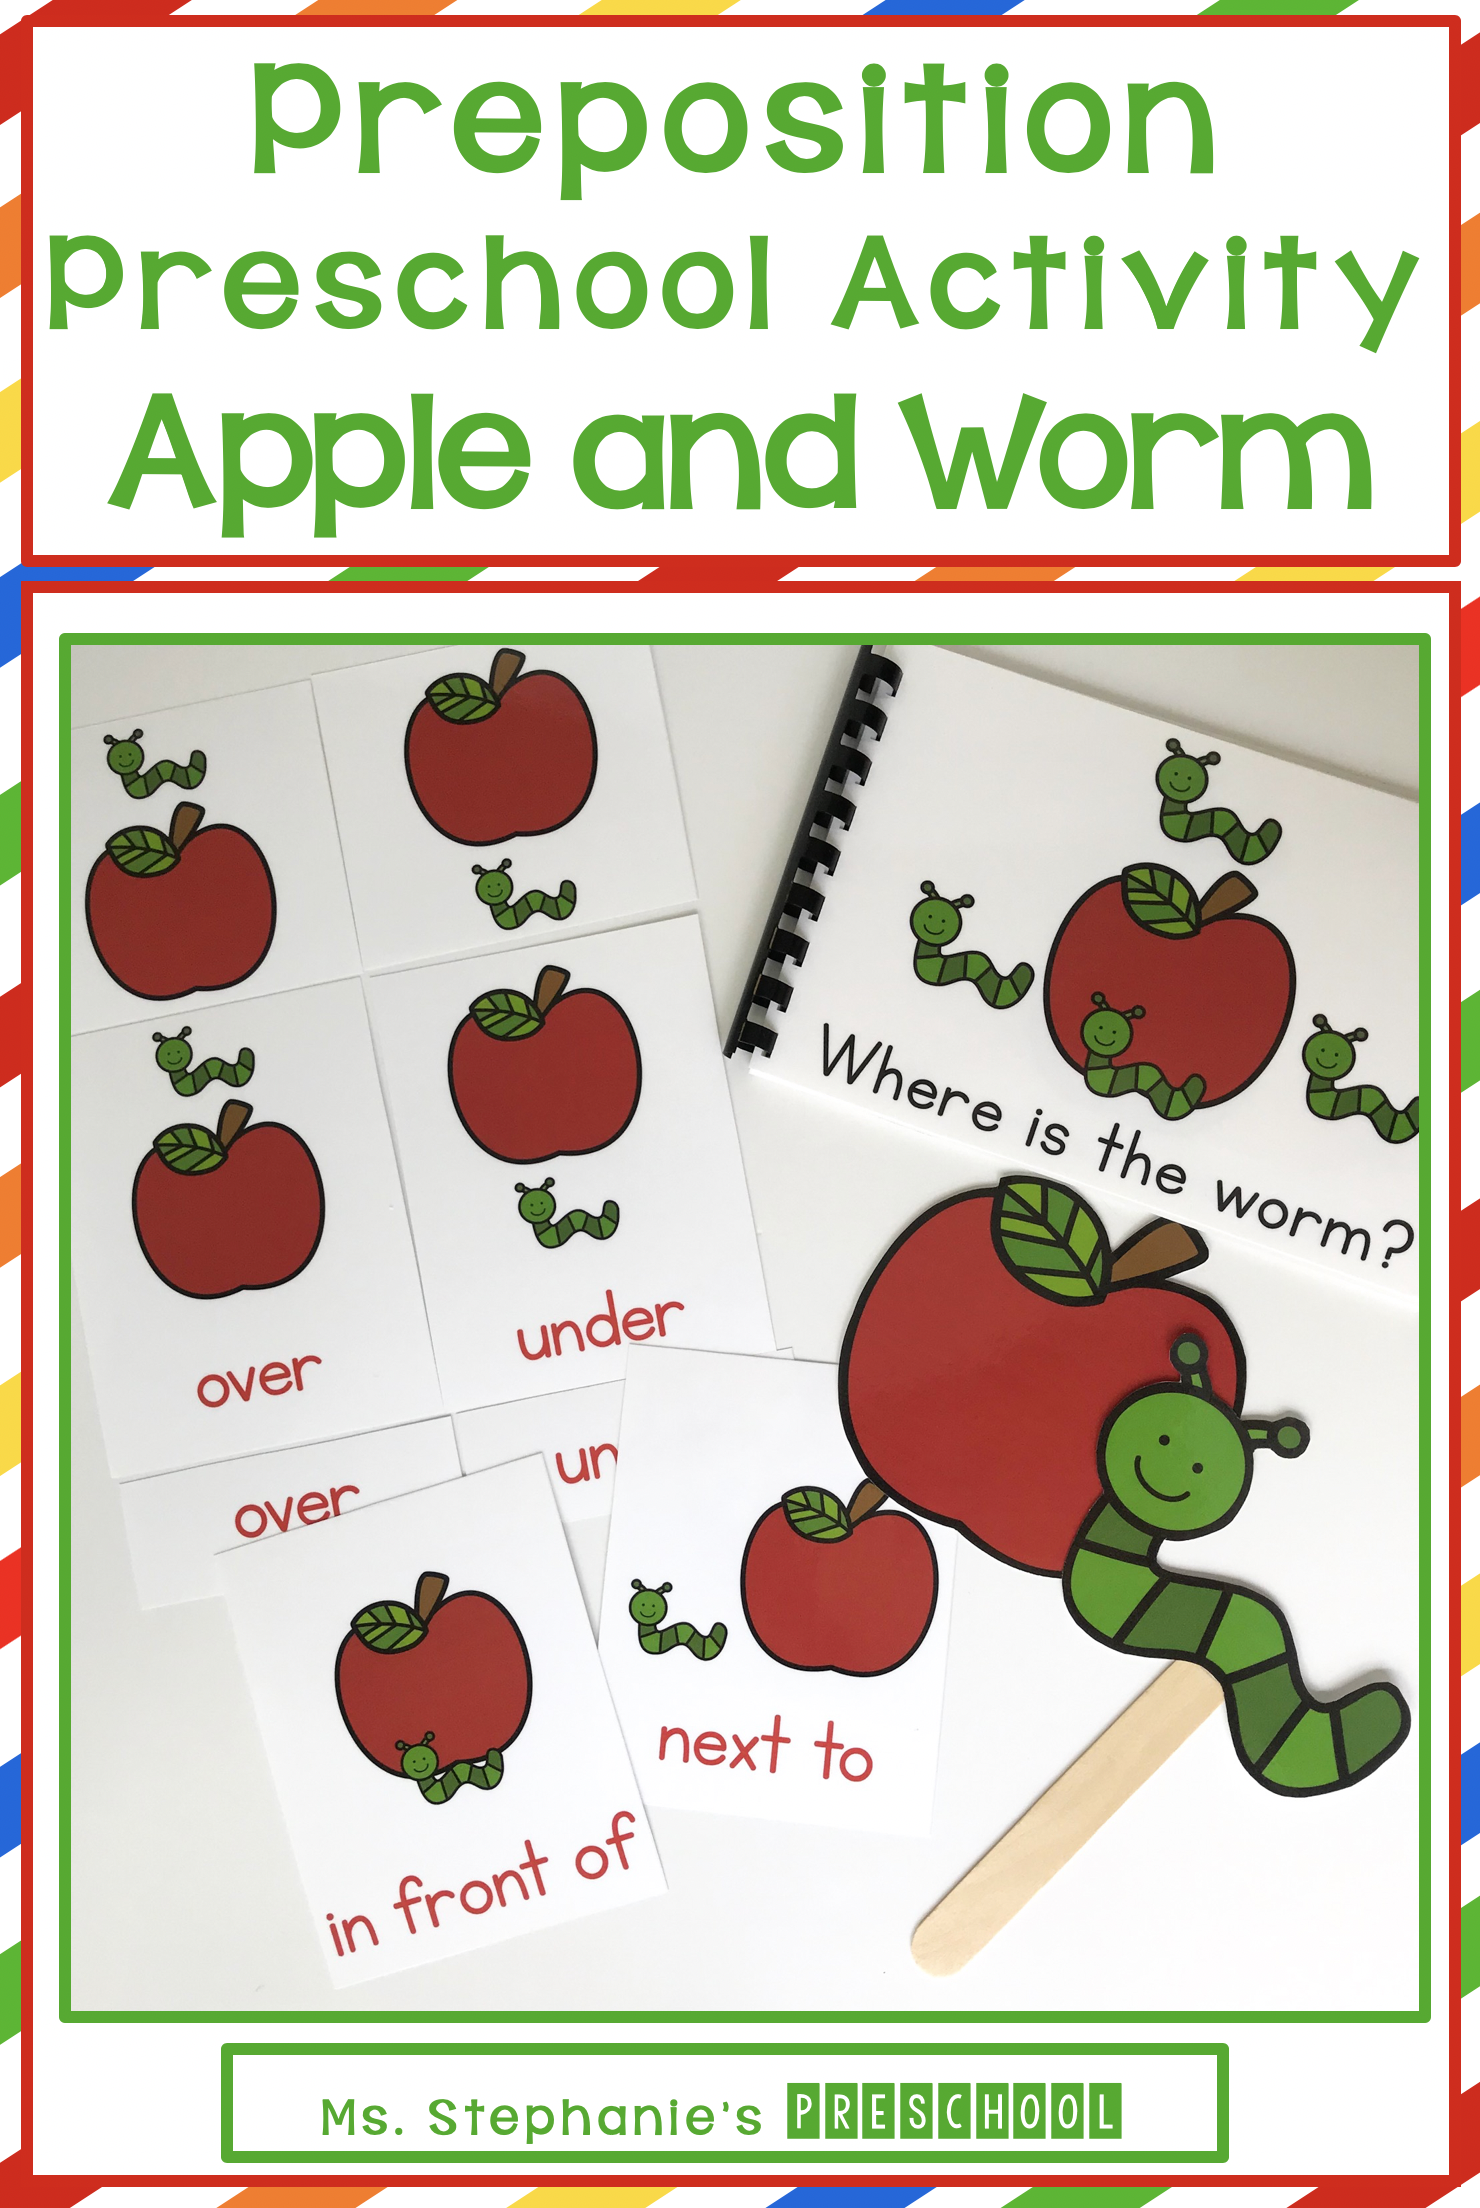 Apple And Worm Preschool Preposition Activity In